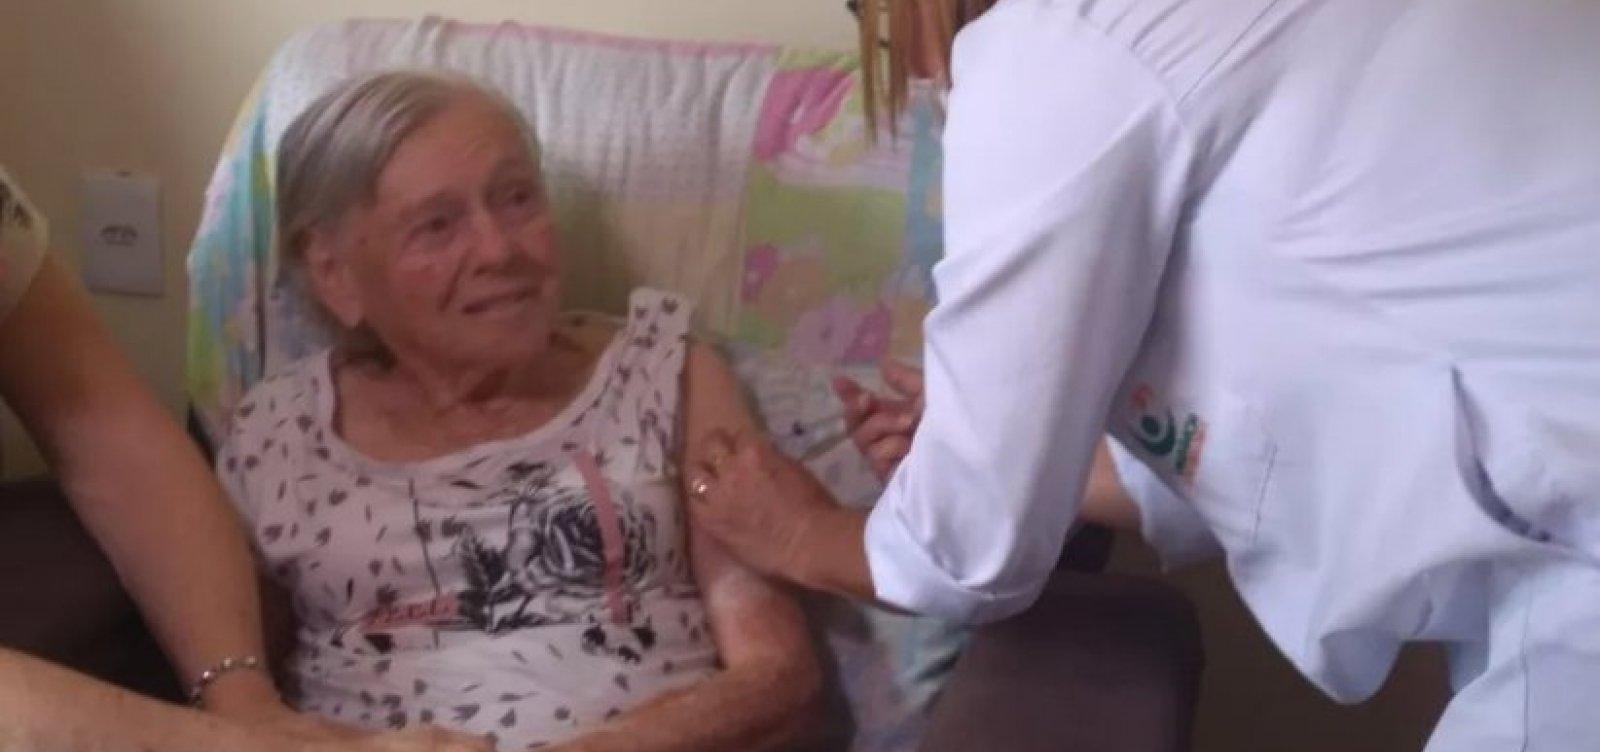 [Mãe de Jair Bolsonaro recebe a segunda dose da vacina contra a Covid-19]